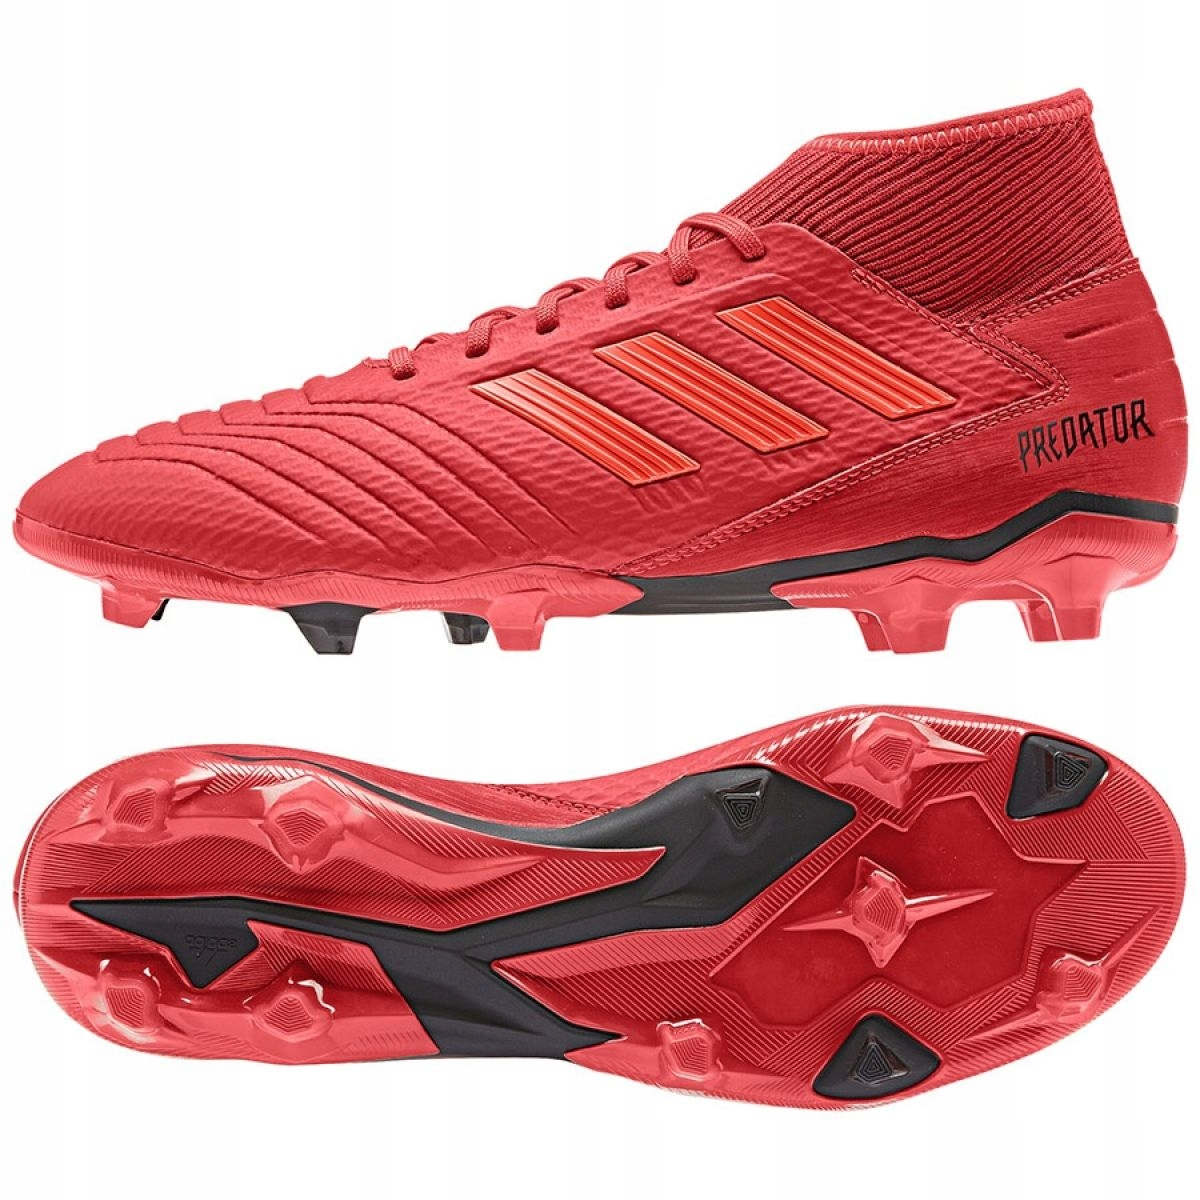 f64abdb39801c Buty piłkarskie adidas Predator 19.3 FG M 43 1 3 - 7718743712 ...